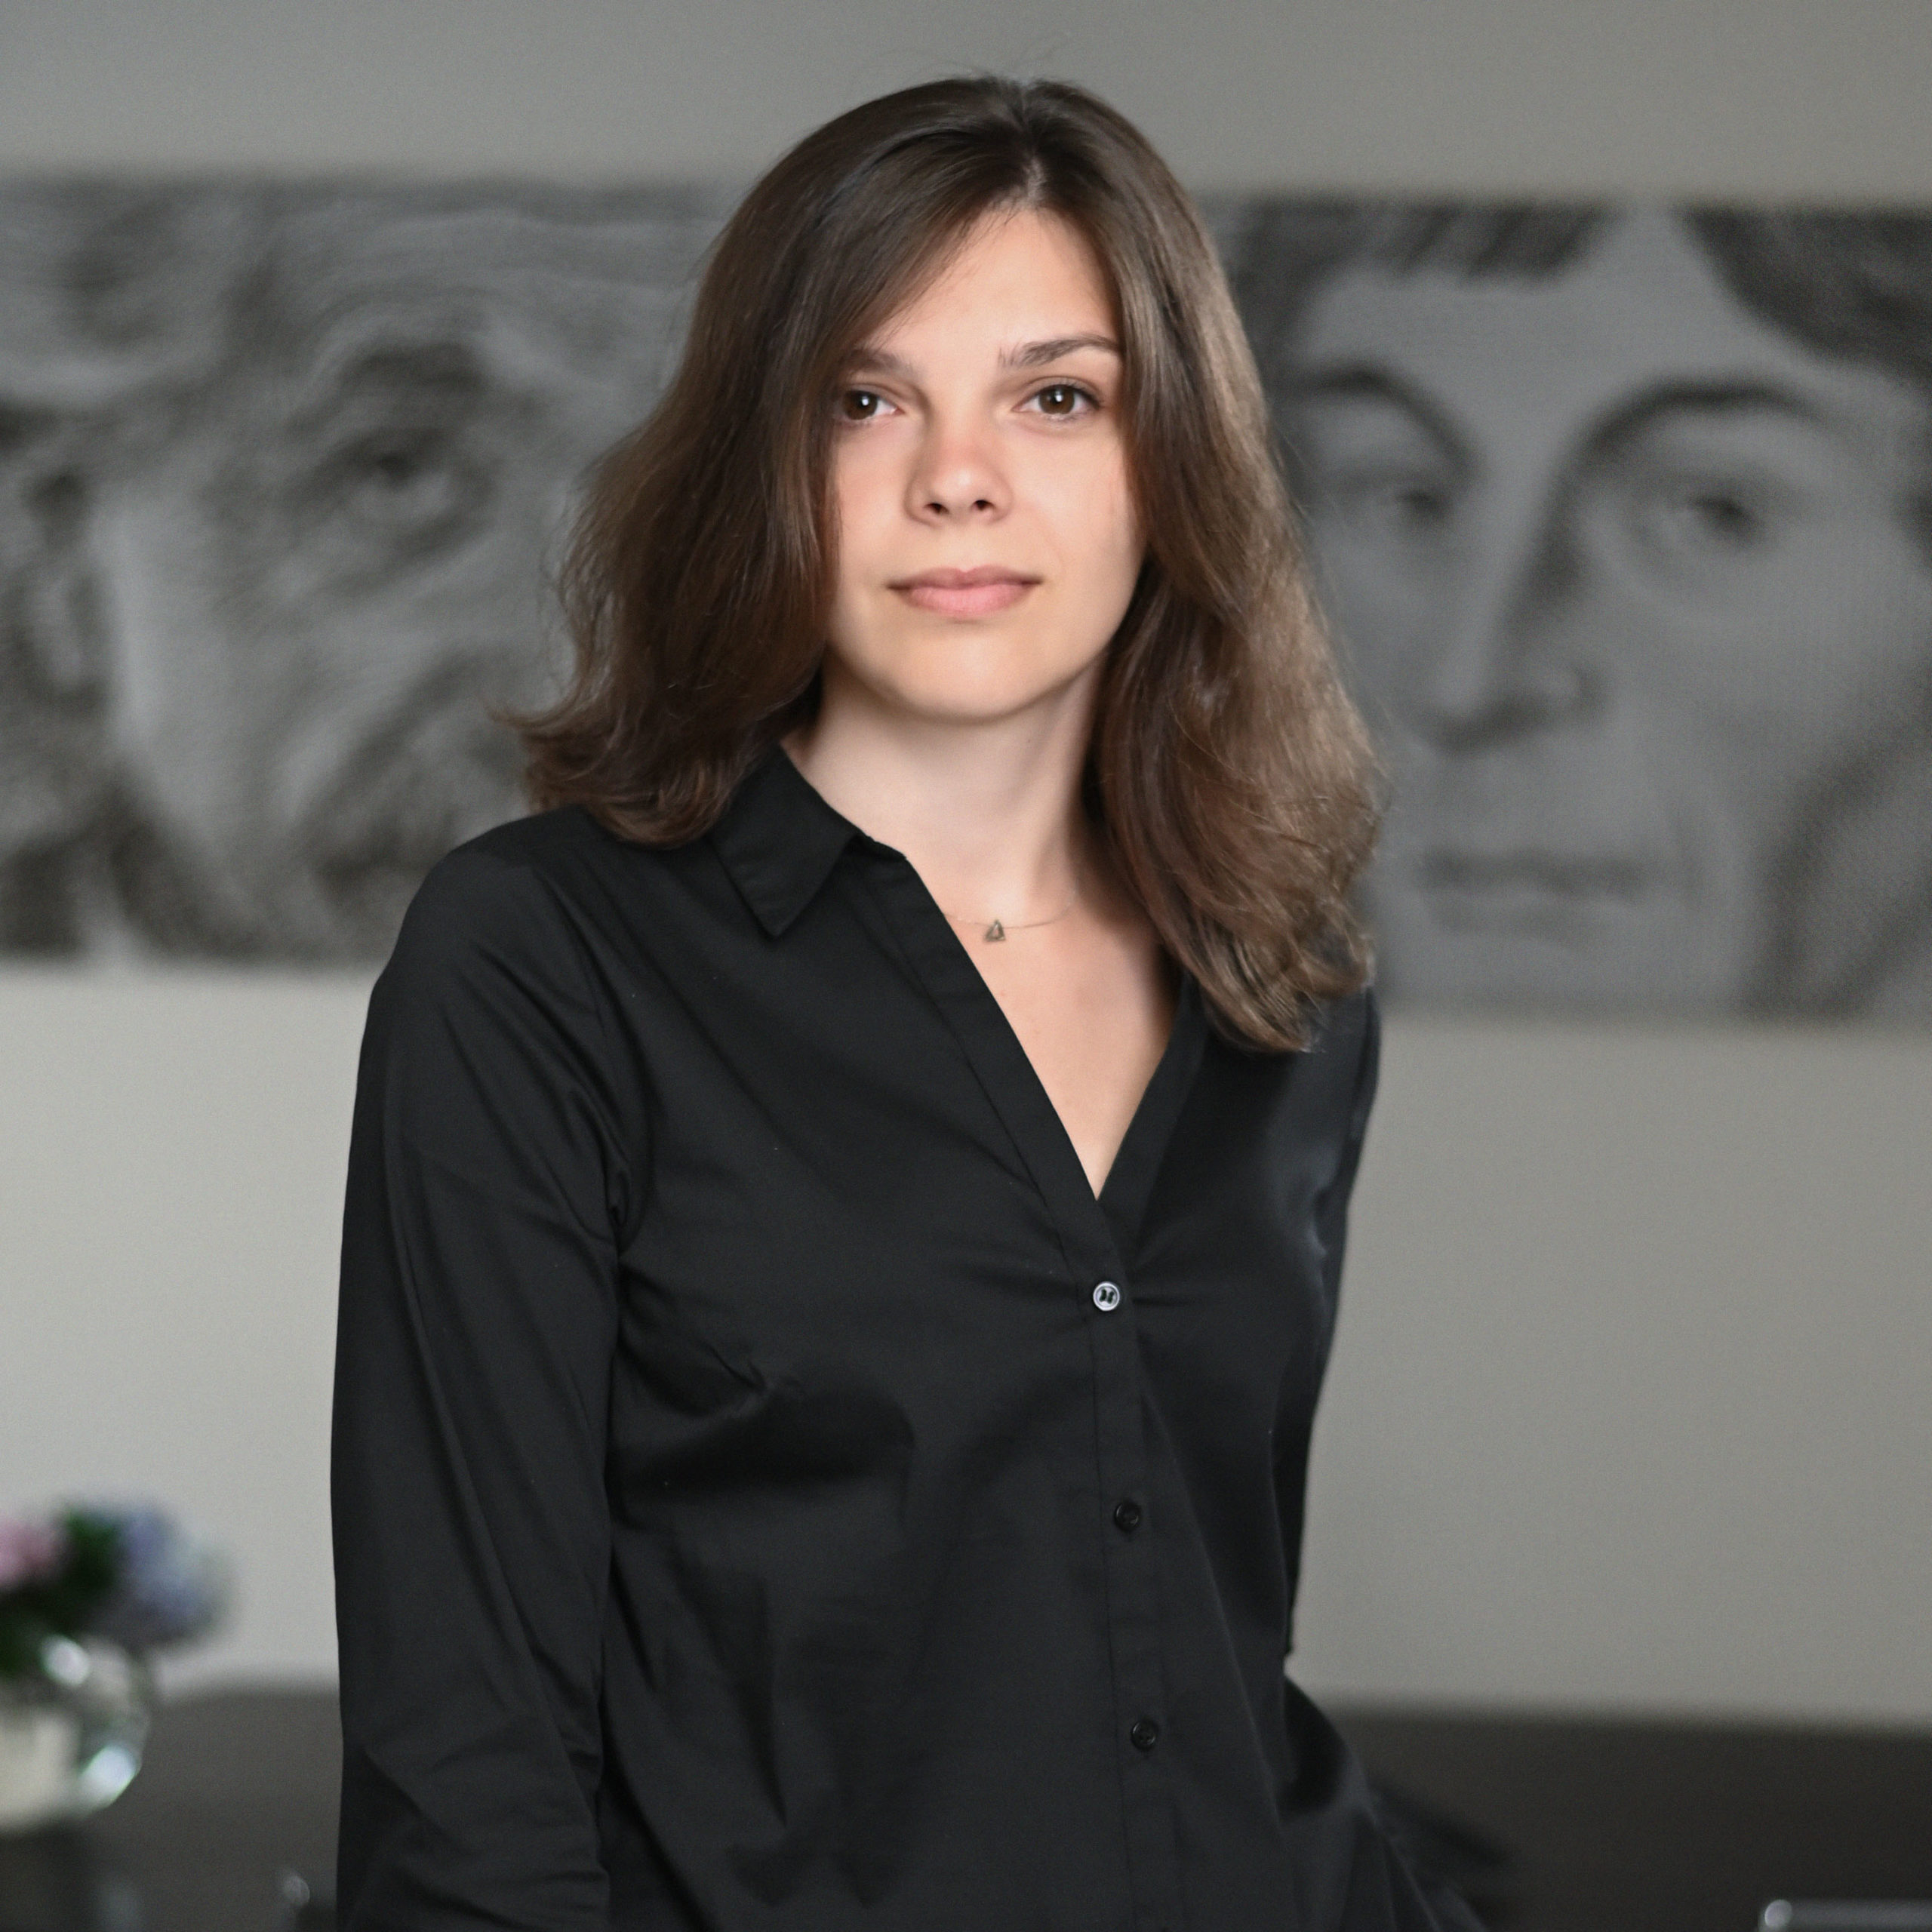 Anastasiia Redko